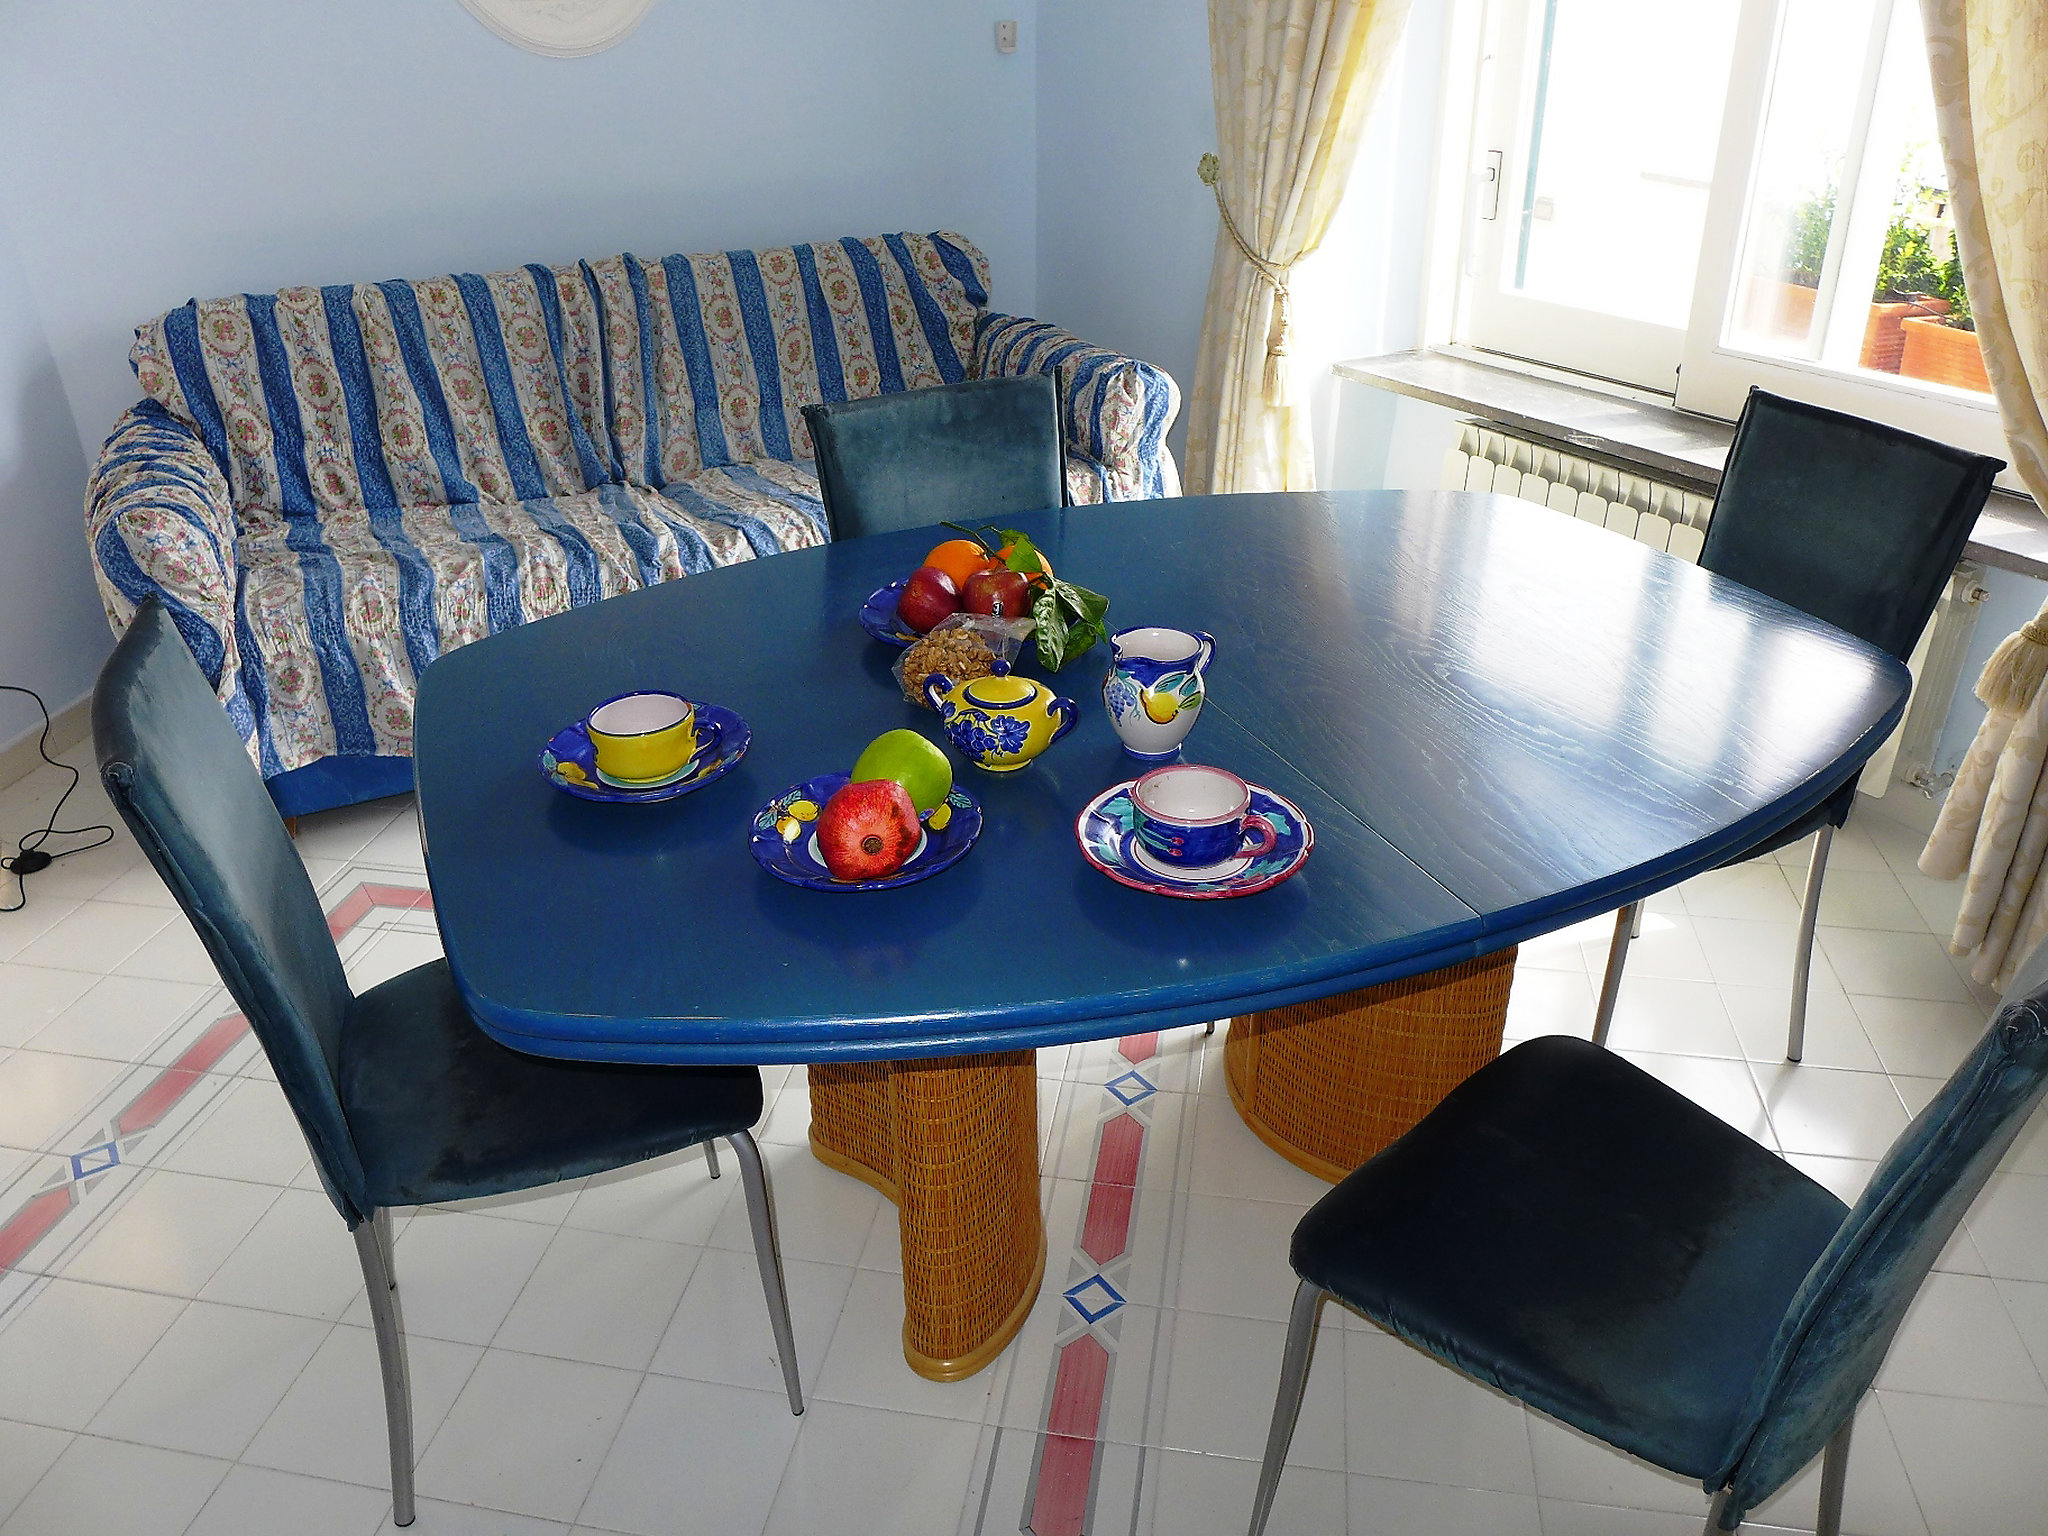 Positano, Italy Apartment #RU494243